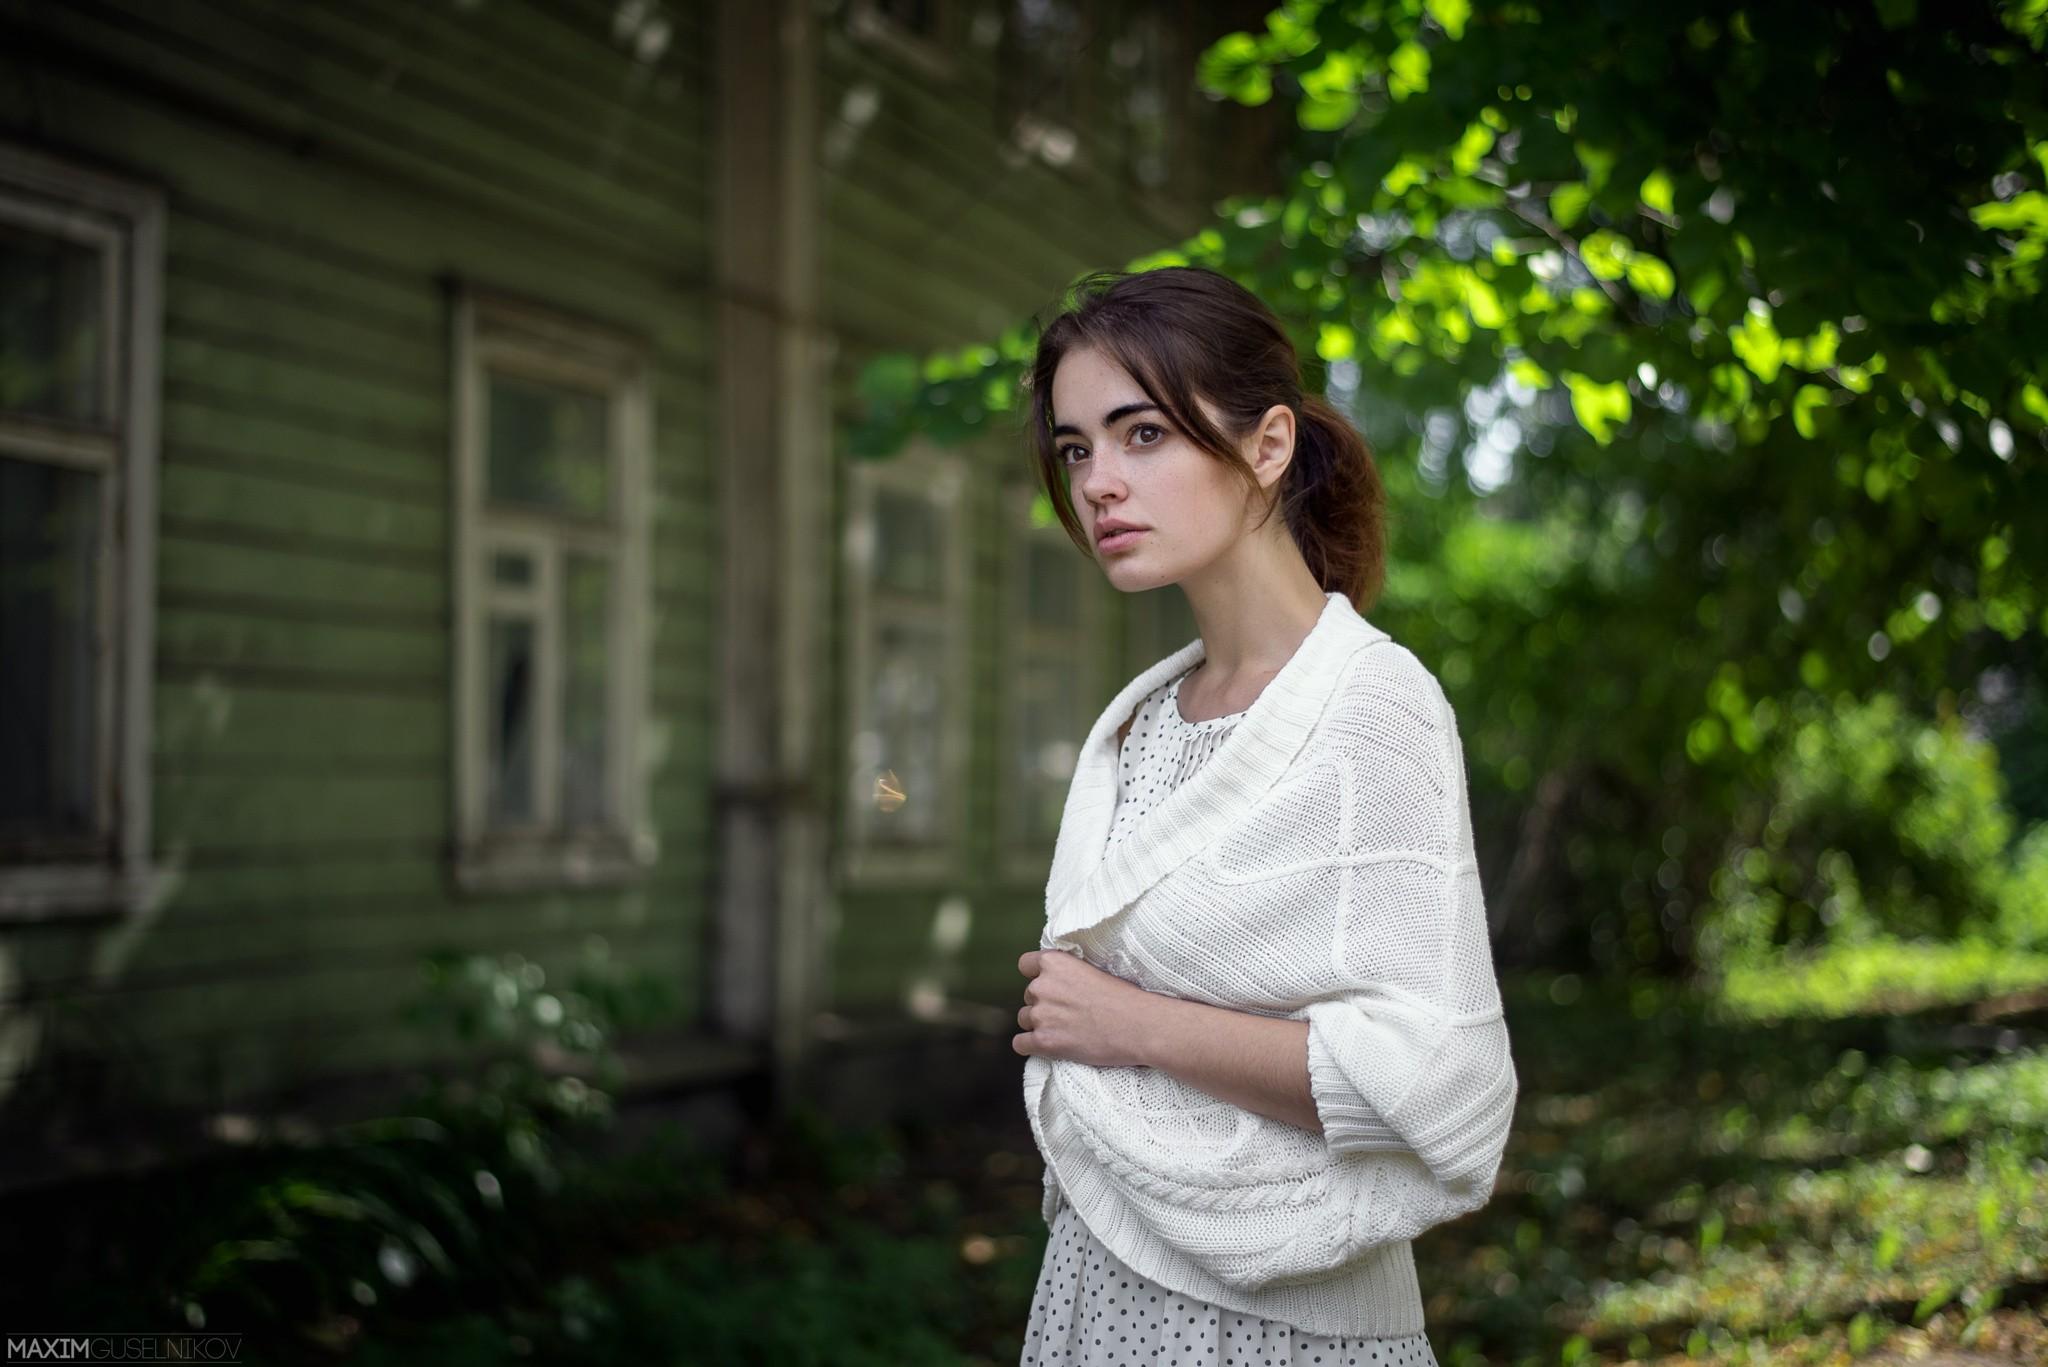 People 2048x1367 women portrait Maxim Guselnikov Lidia Savoderova brunette